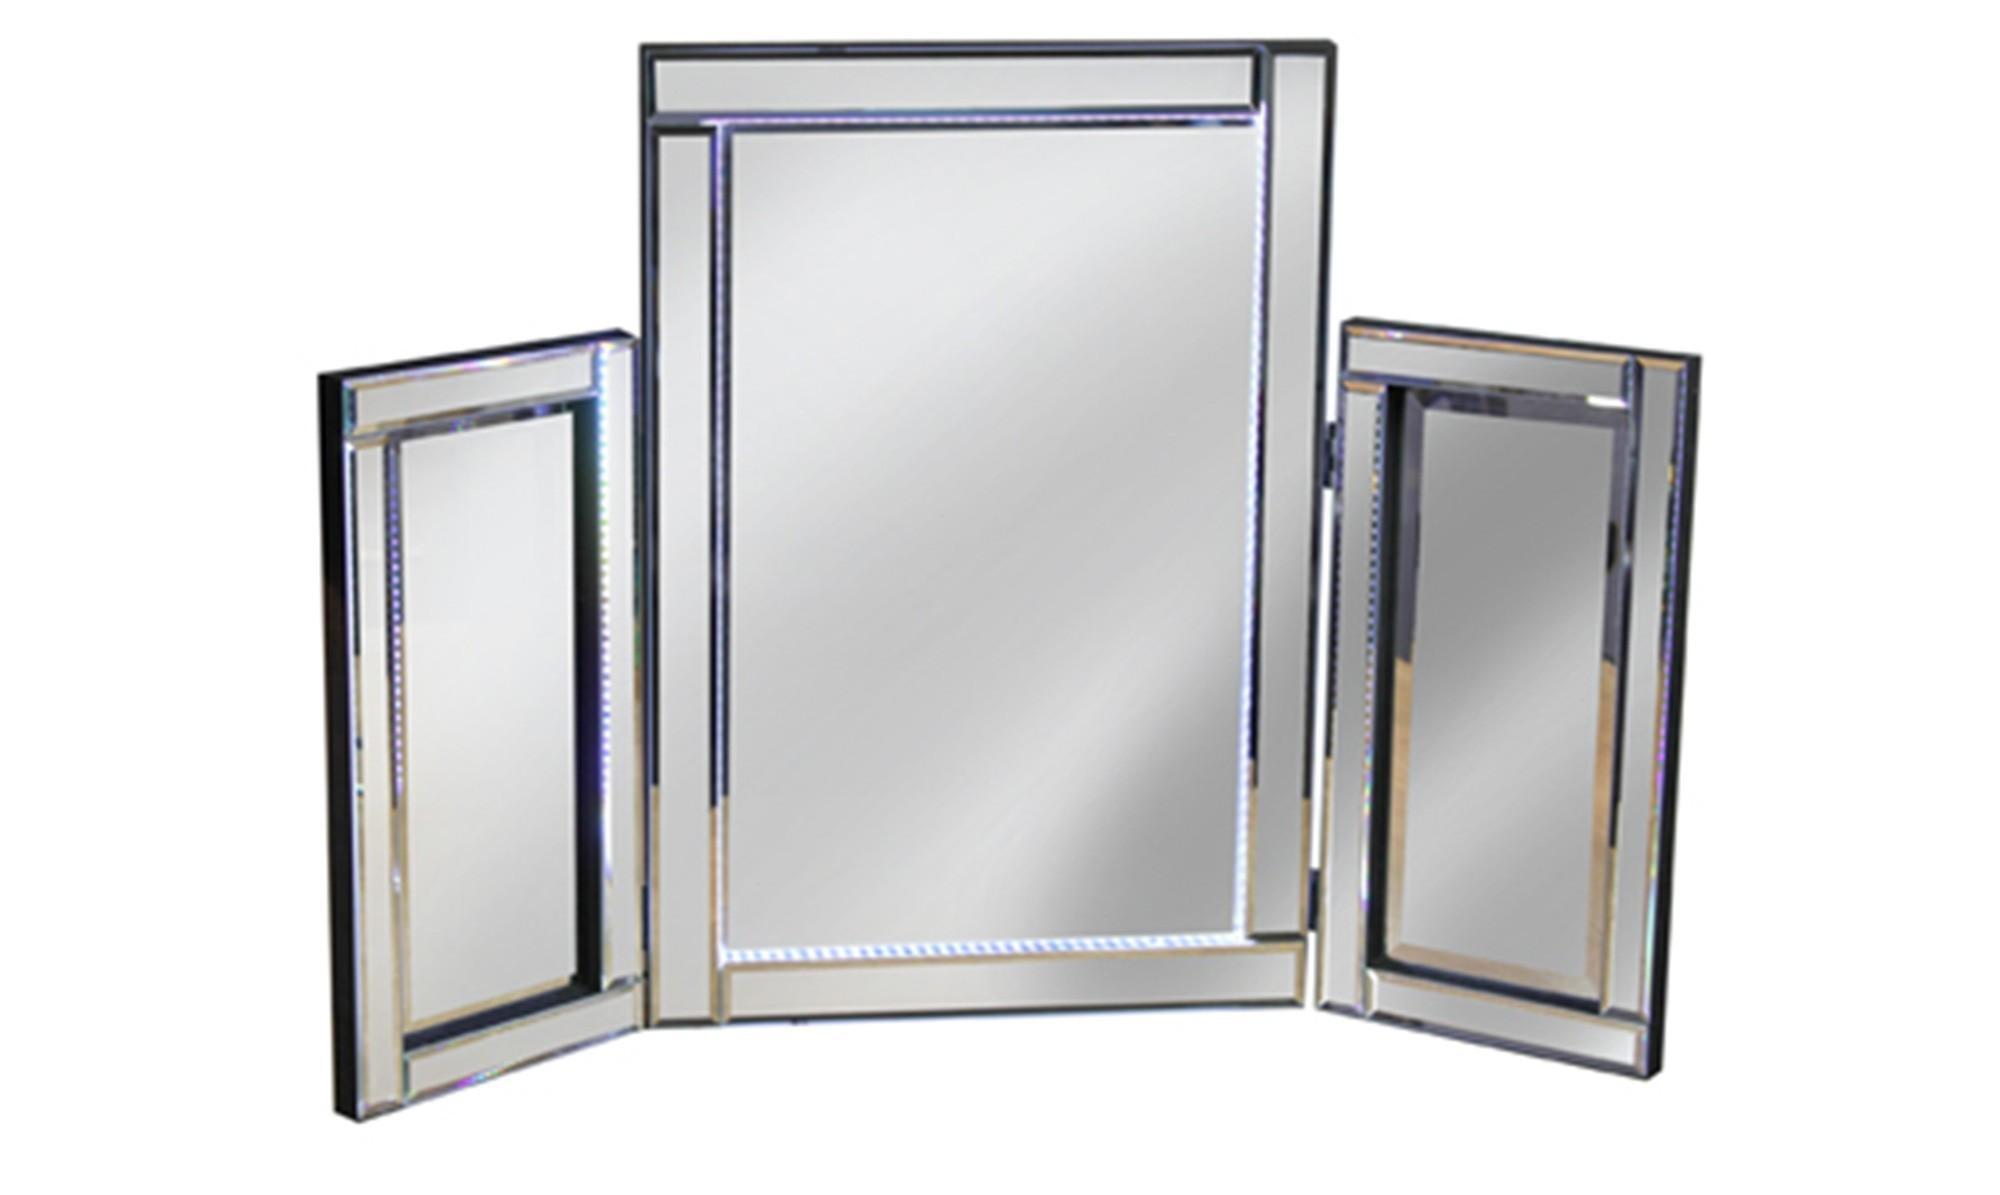 Elegant Dressing Table Mirror Dressing Table Mirror Image Of In Inside Dressing Table Mirrors (View 7 of 20)